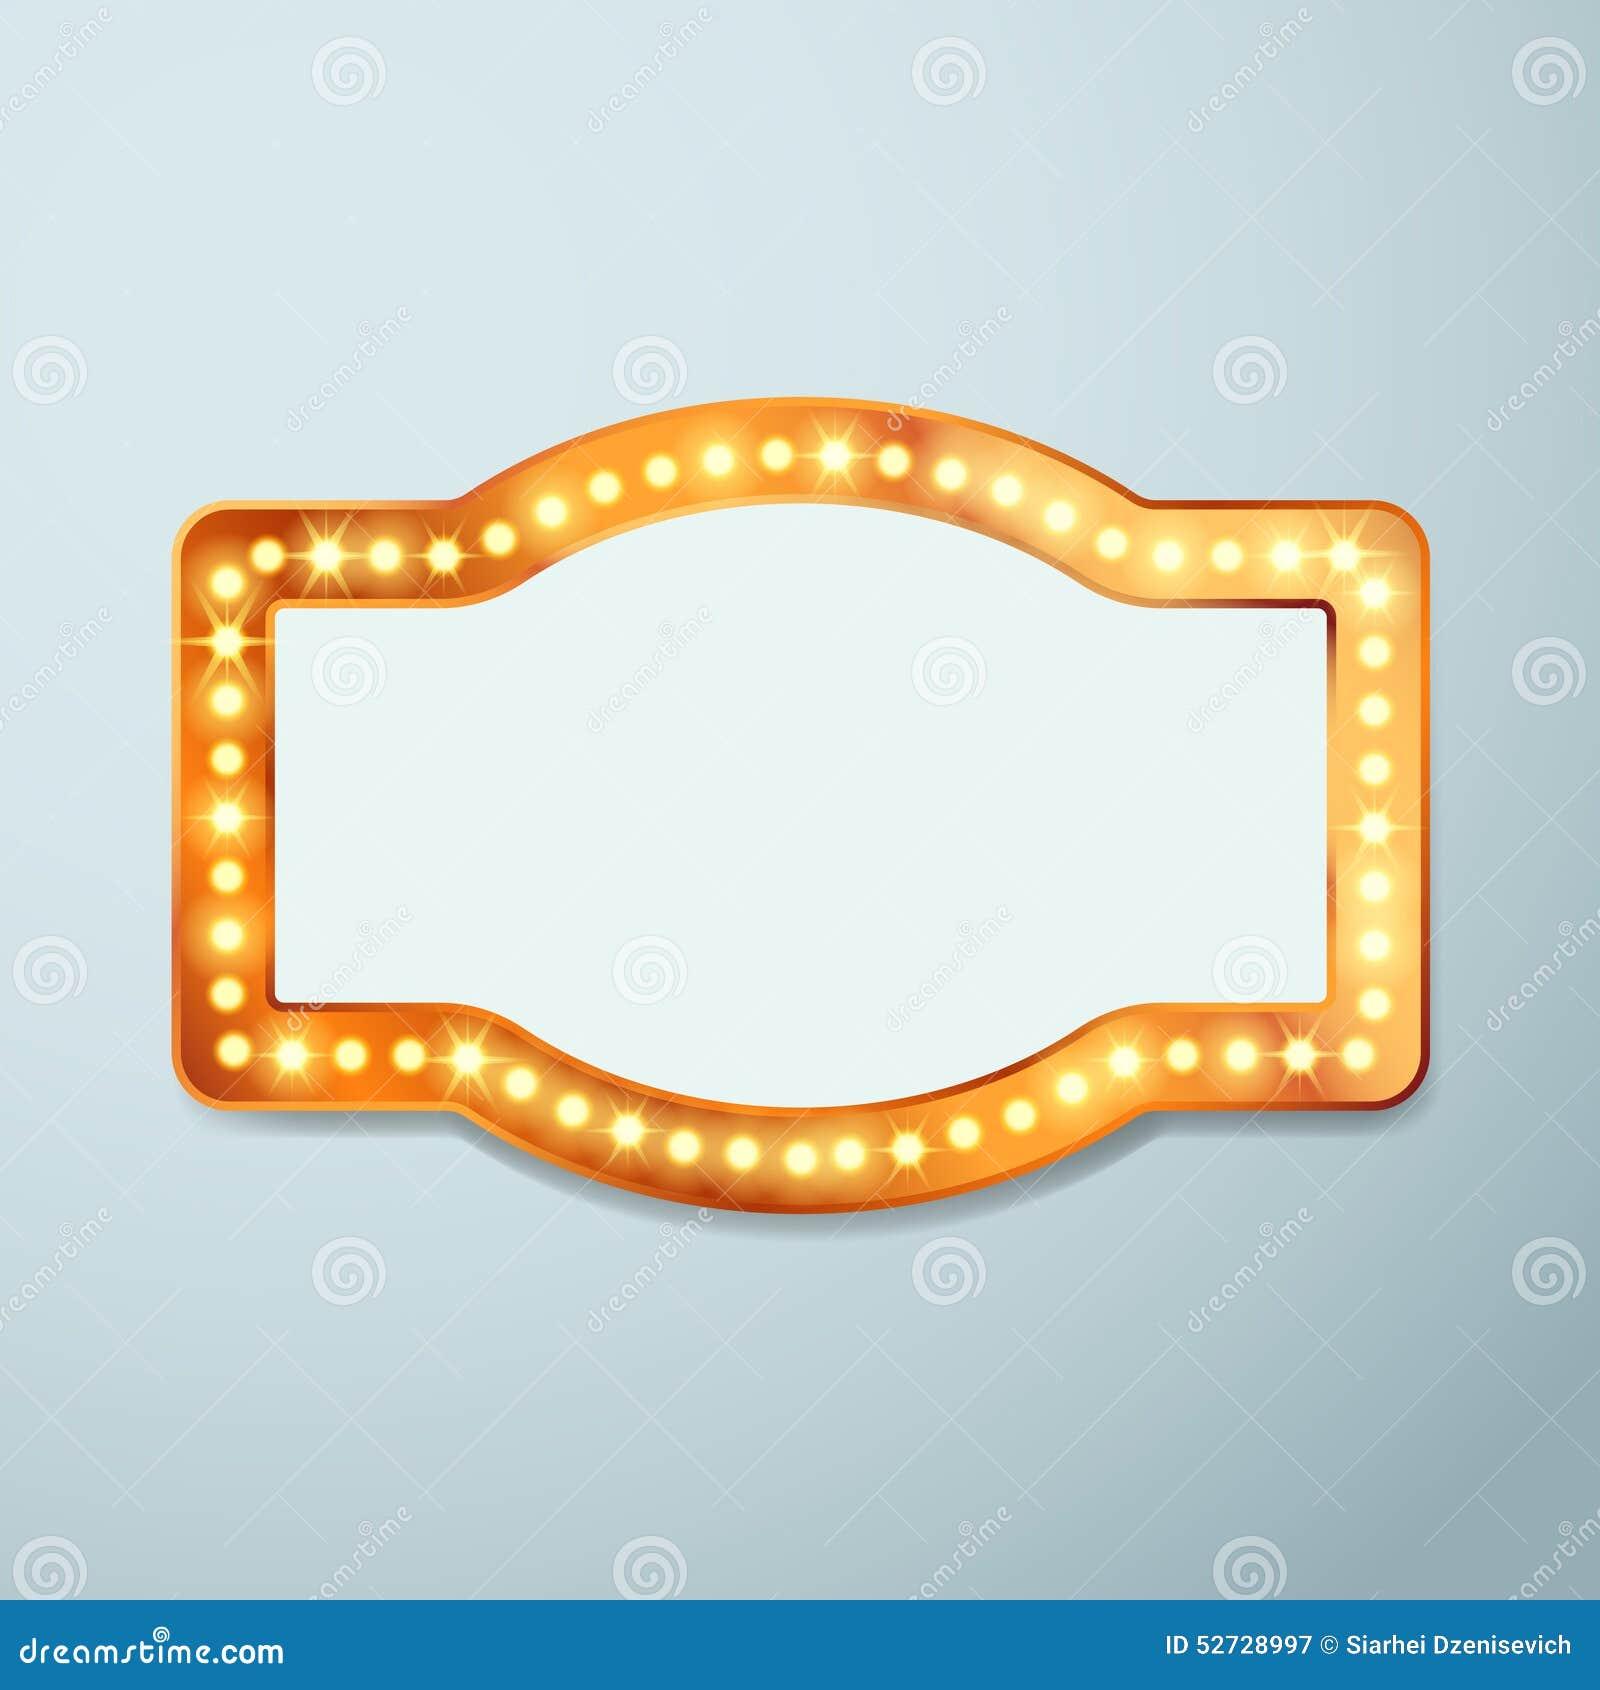 Retro Bulb Circus Cinema Light Sign Template Stock Vector